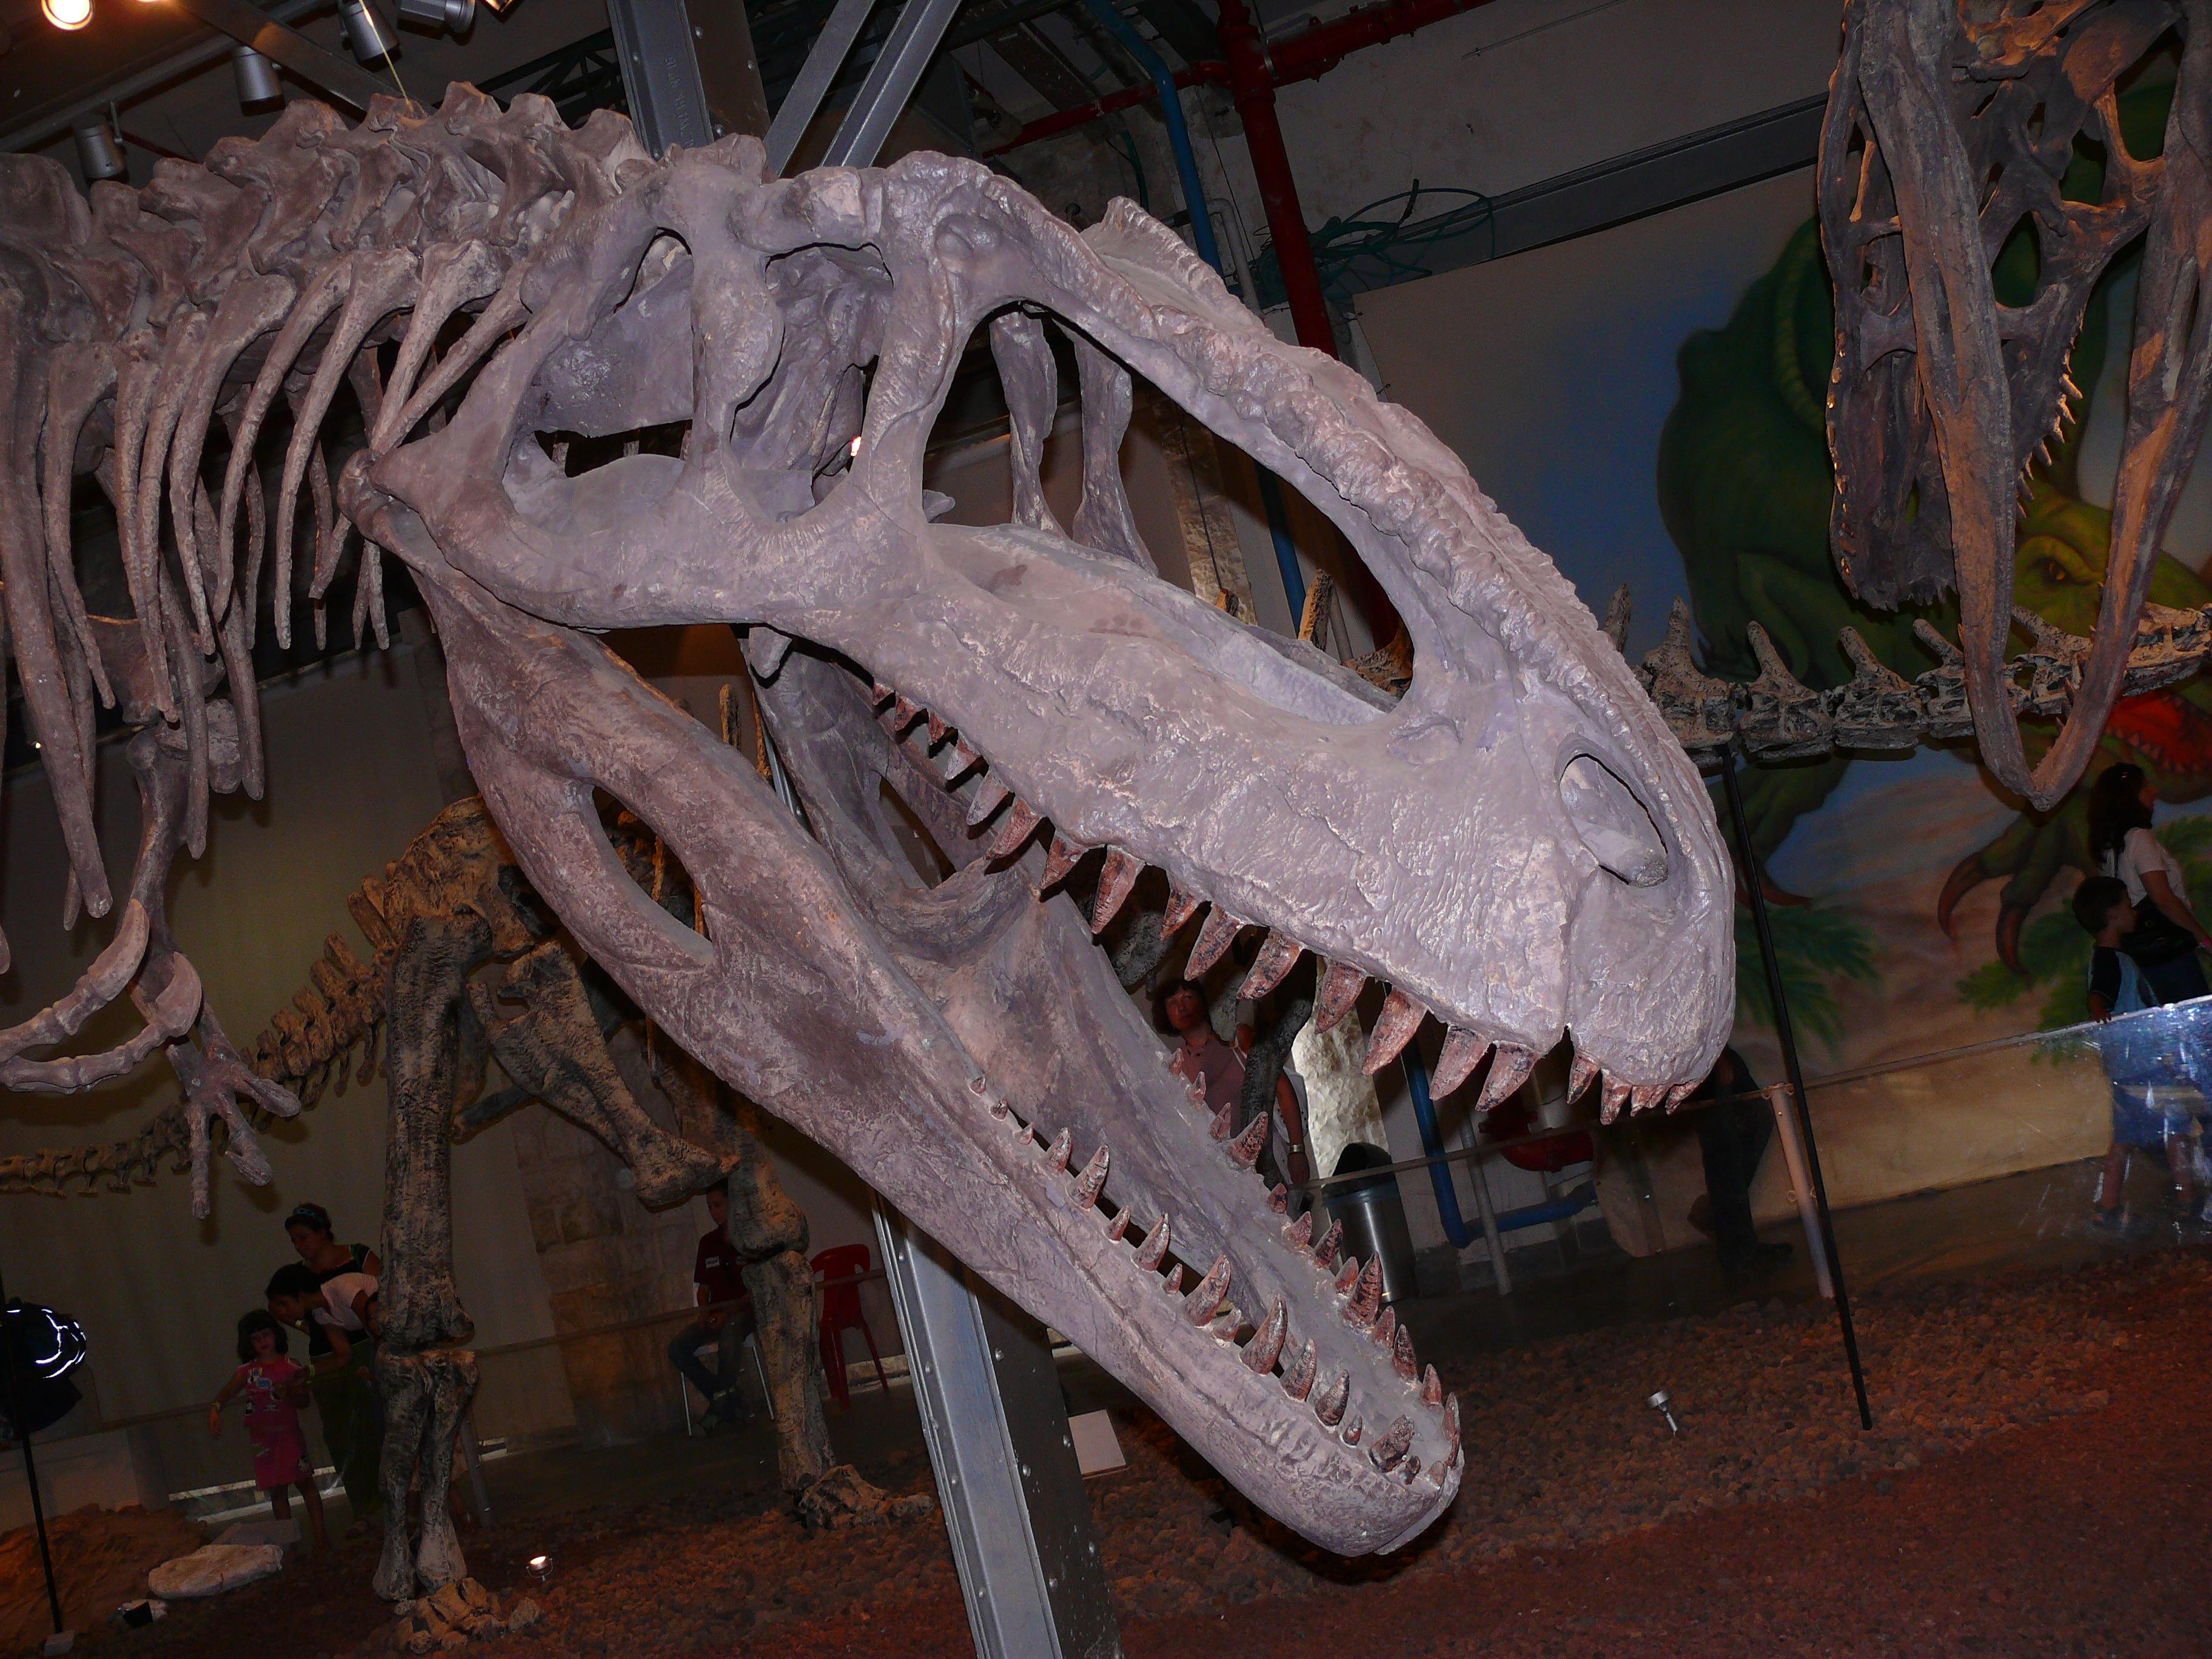 giganotosaurus haifa-aug2008.jpg